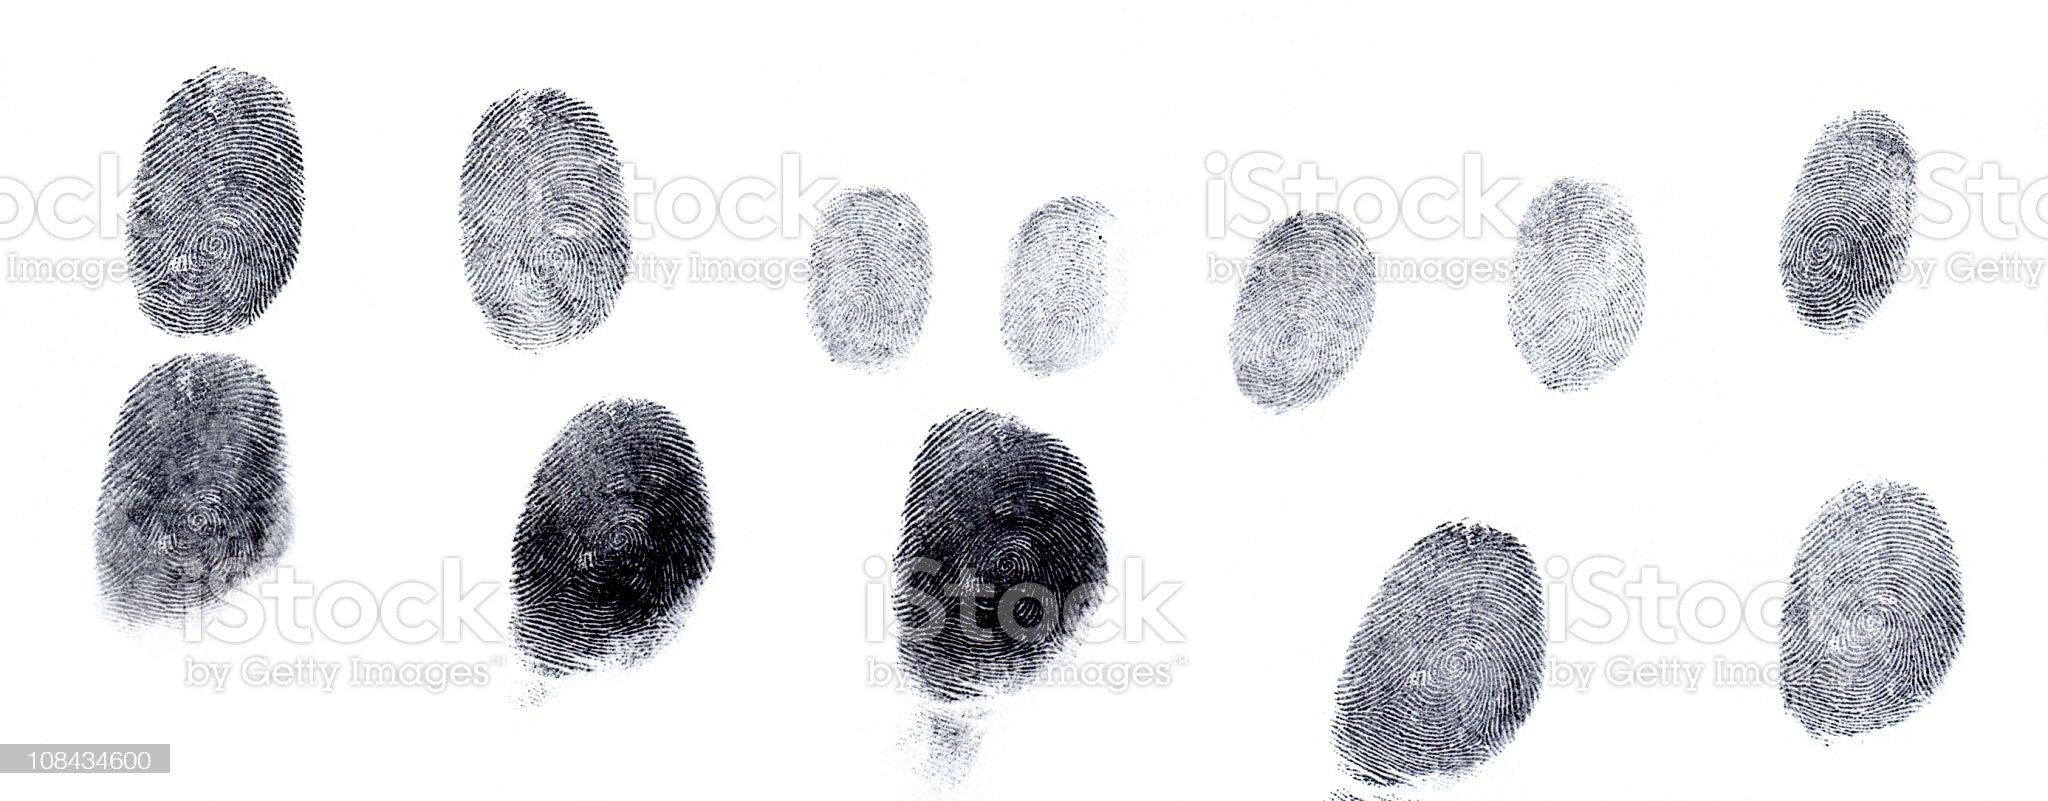 Assorted fingerprints royalty-free stock photo